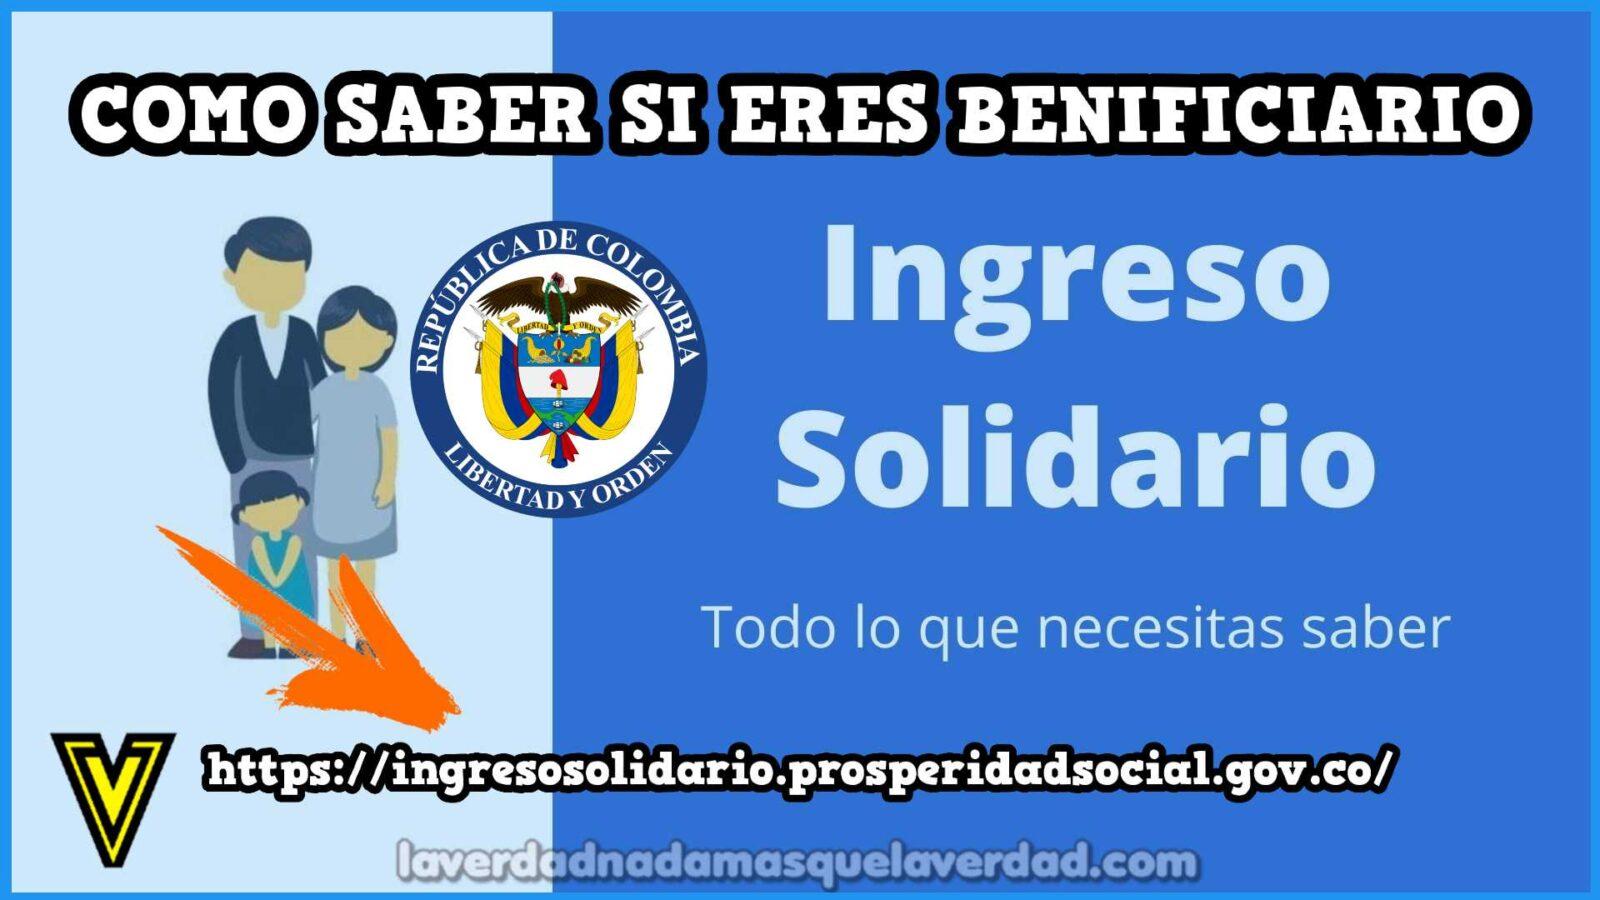 https://ingresosolidario.prosperidadsocial.gov.co/